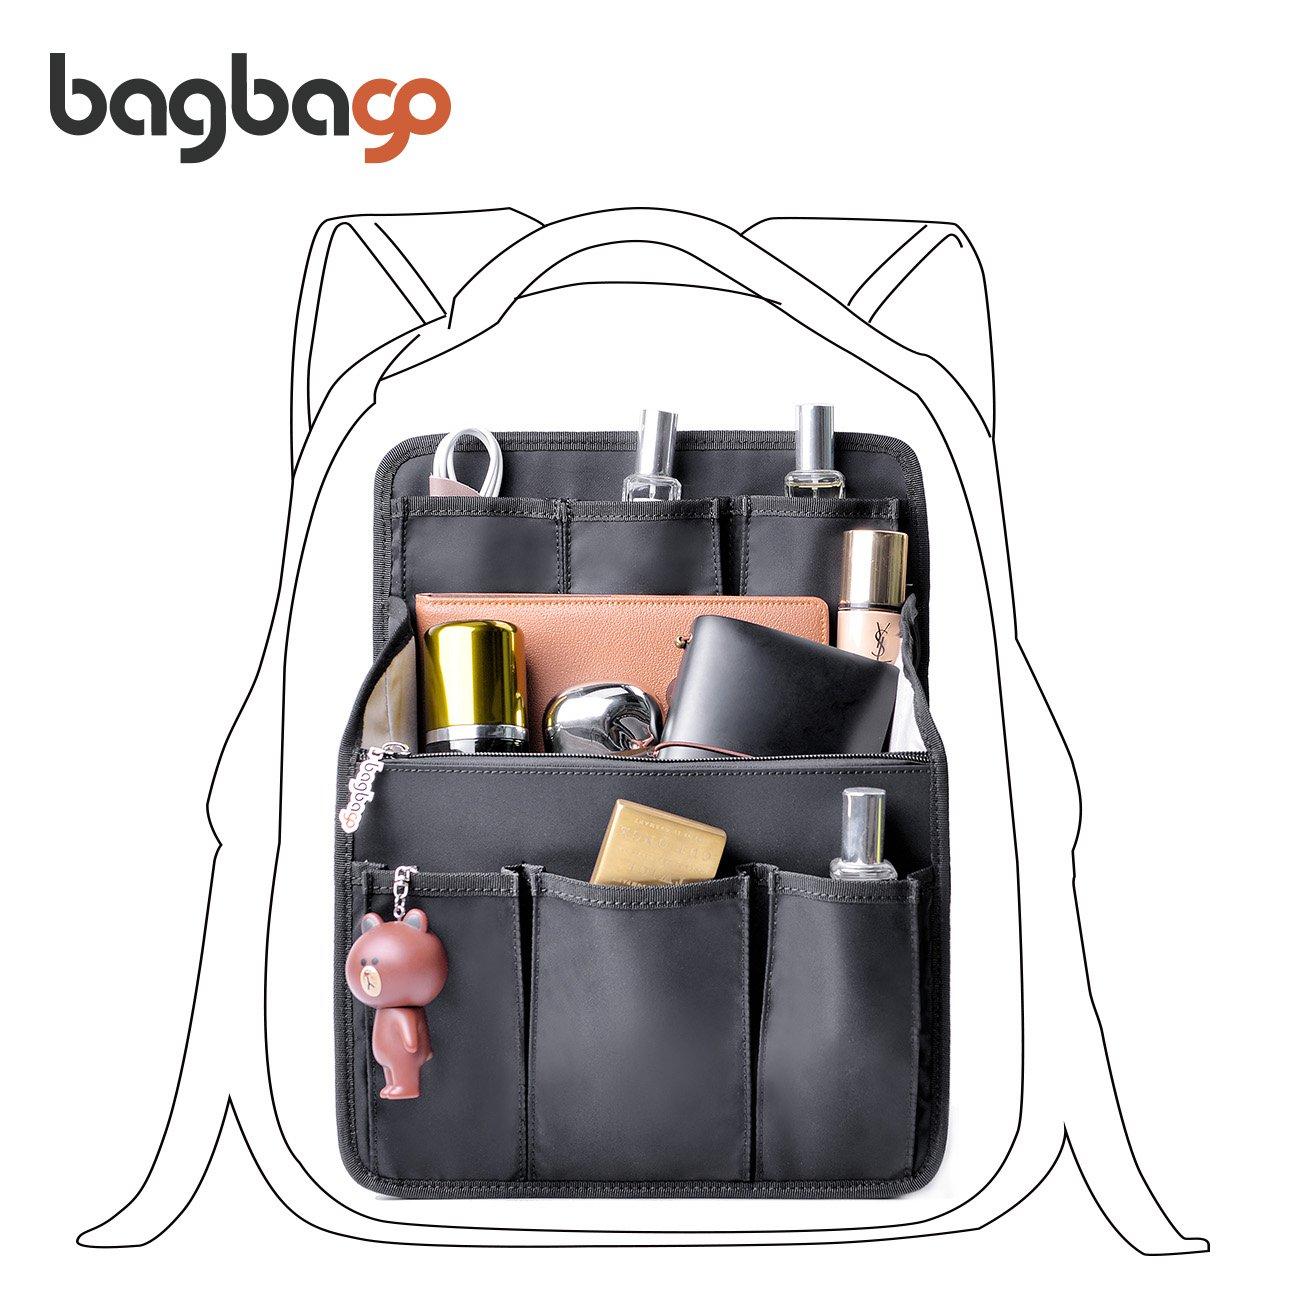 bag in bag Multi-functional Contrast Bag Shoulders Bag Rucksack Insert Backpack Organizer,Black